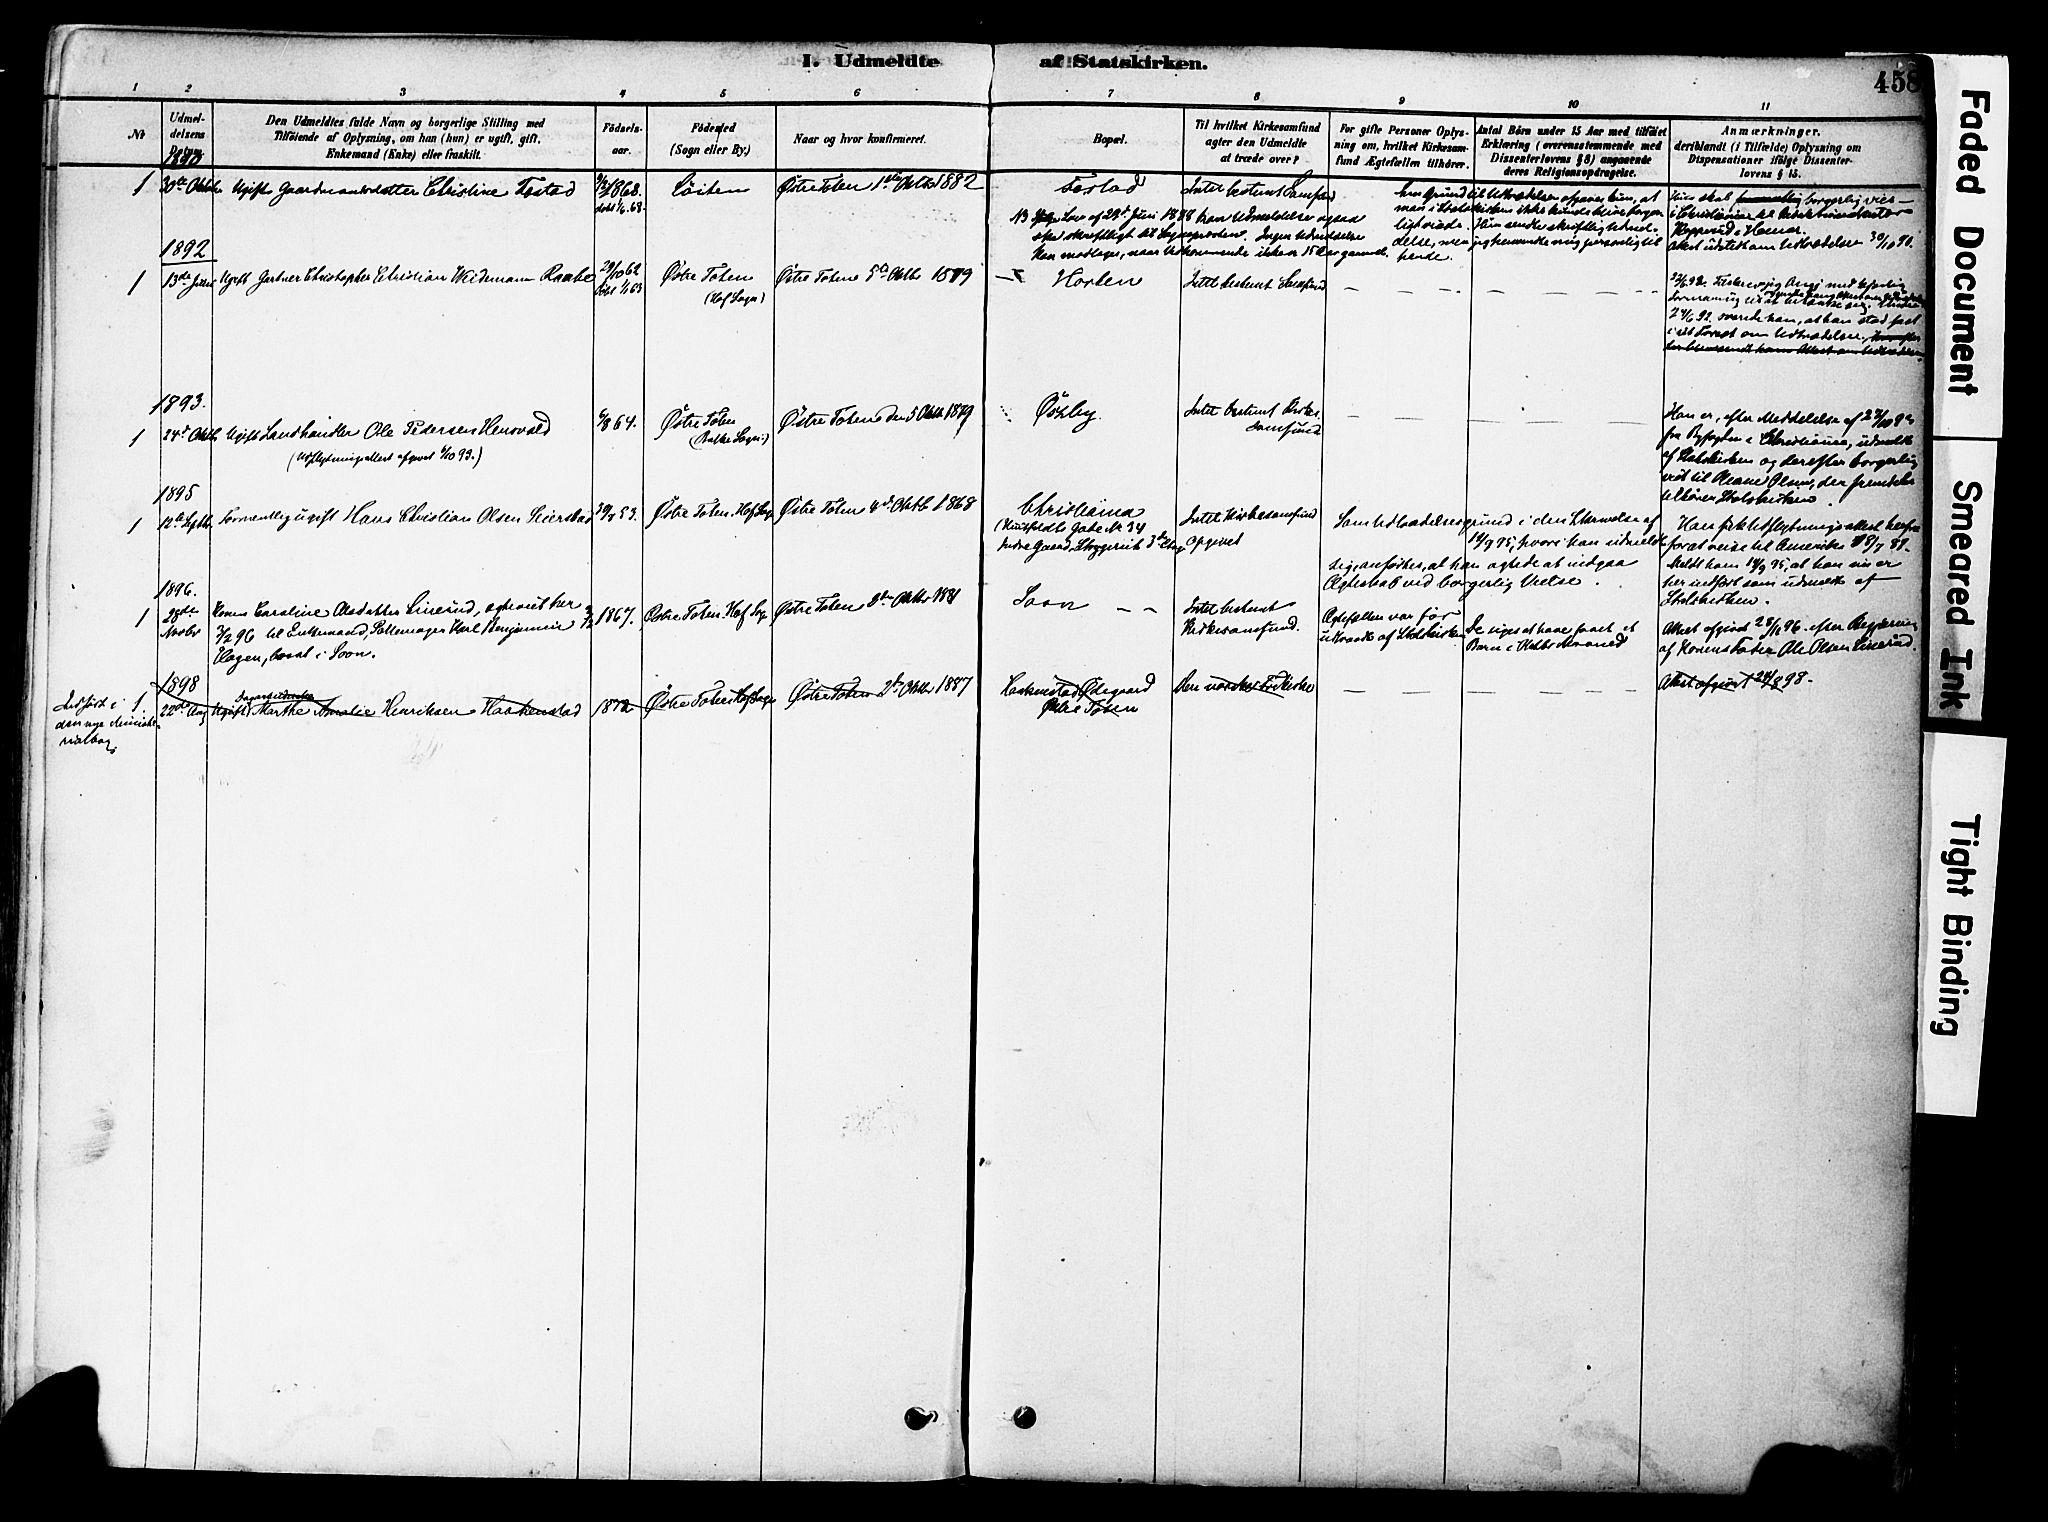 SAH, Østre Toten prestekontor, Ministerialbok nr. 6 /1, 1878-1896, s. 458